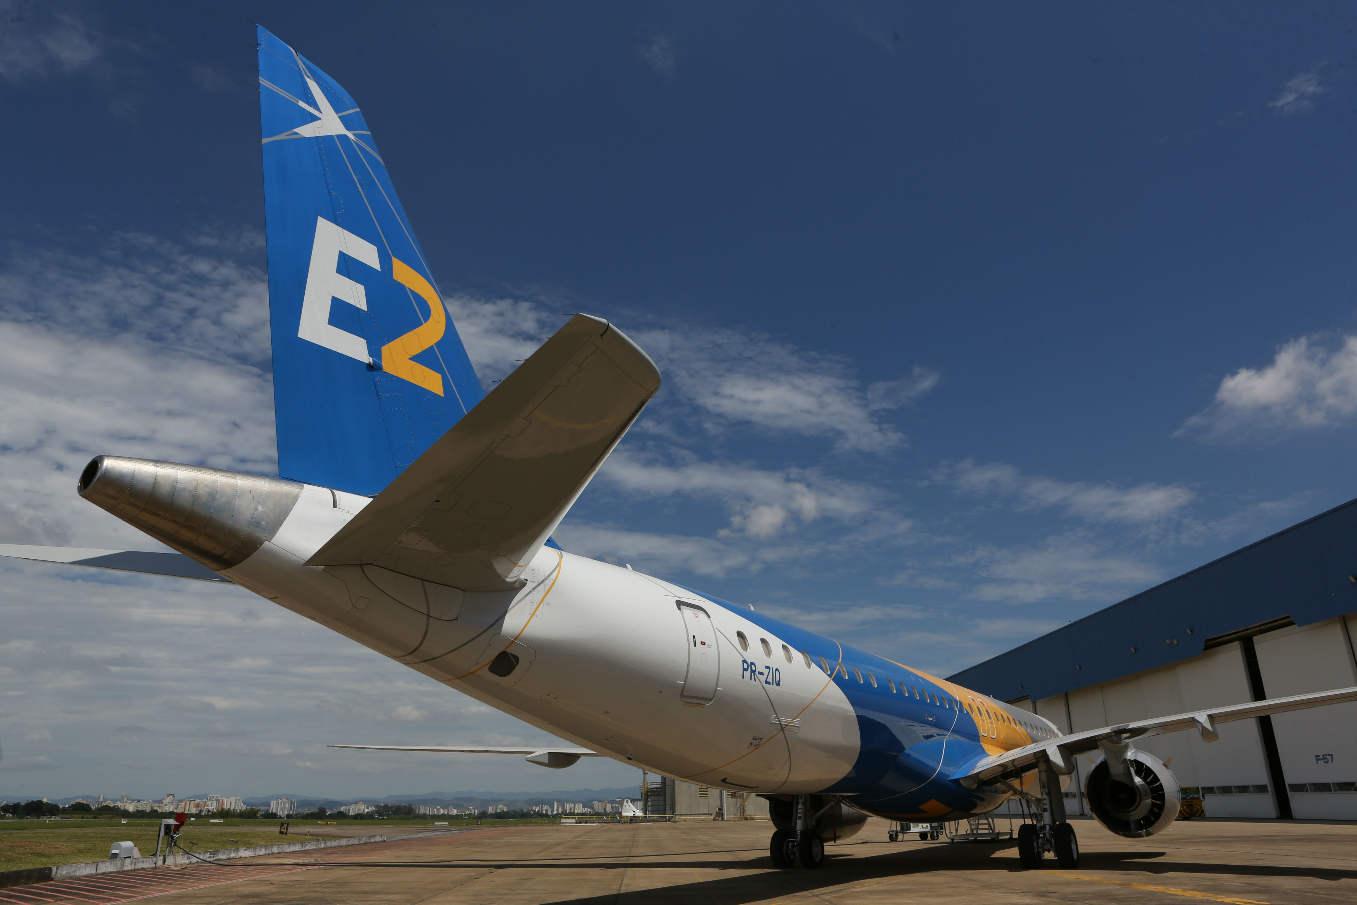 Farnborough 2018: Embraer foresees $600bn market